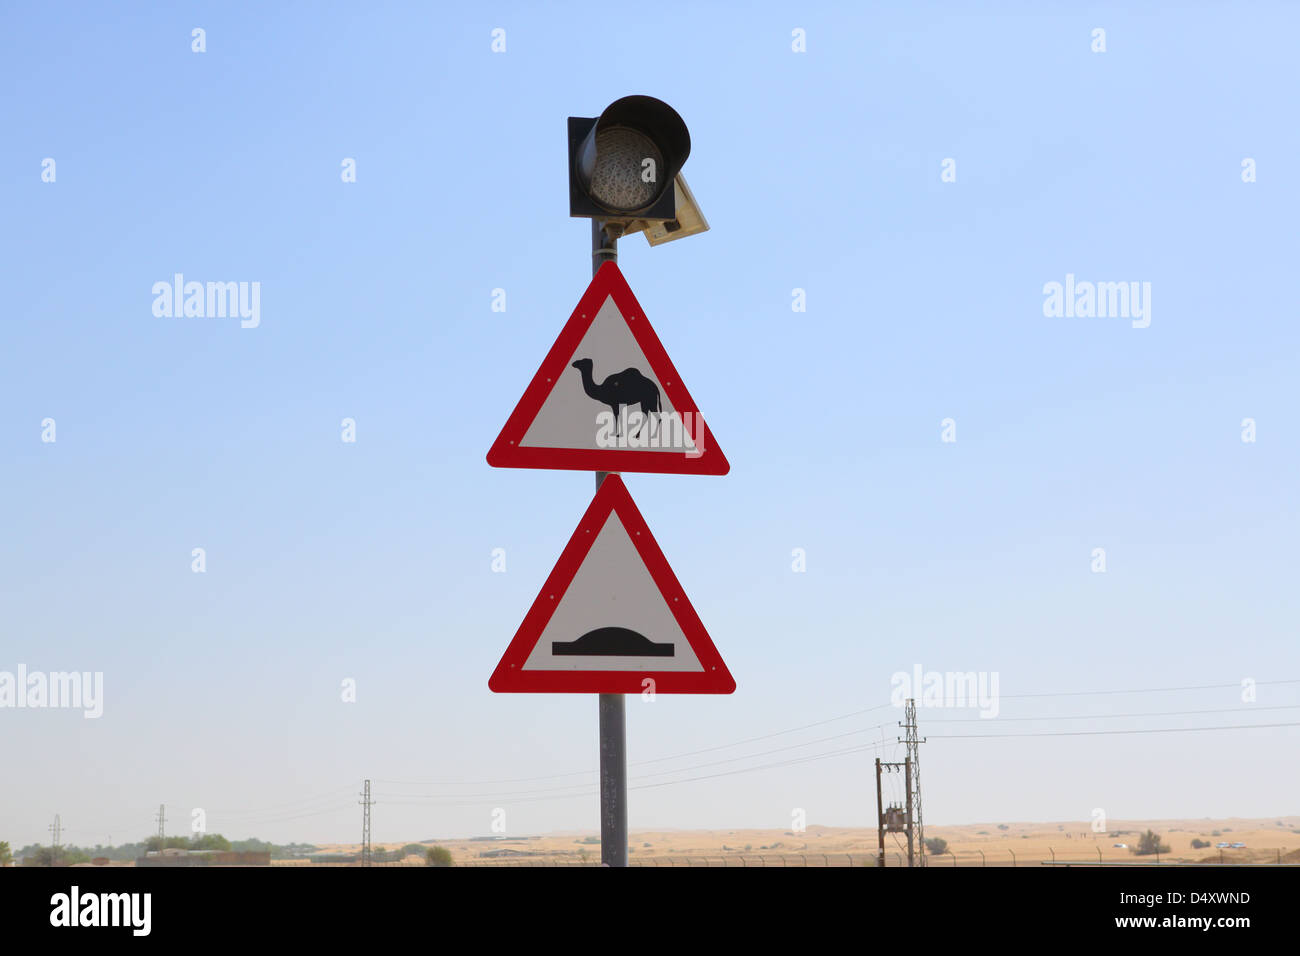 Camel crossing sign, Dubai, United Arab Emirates - Stock Image